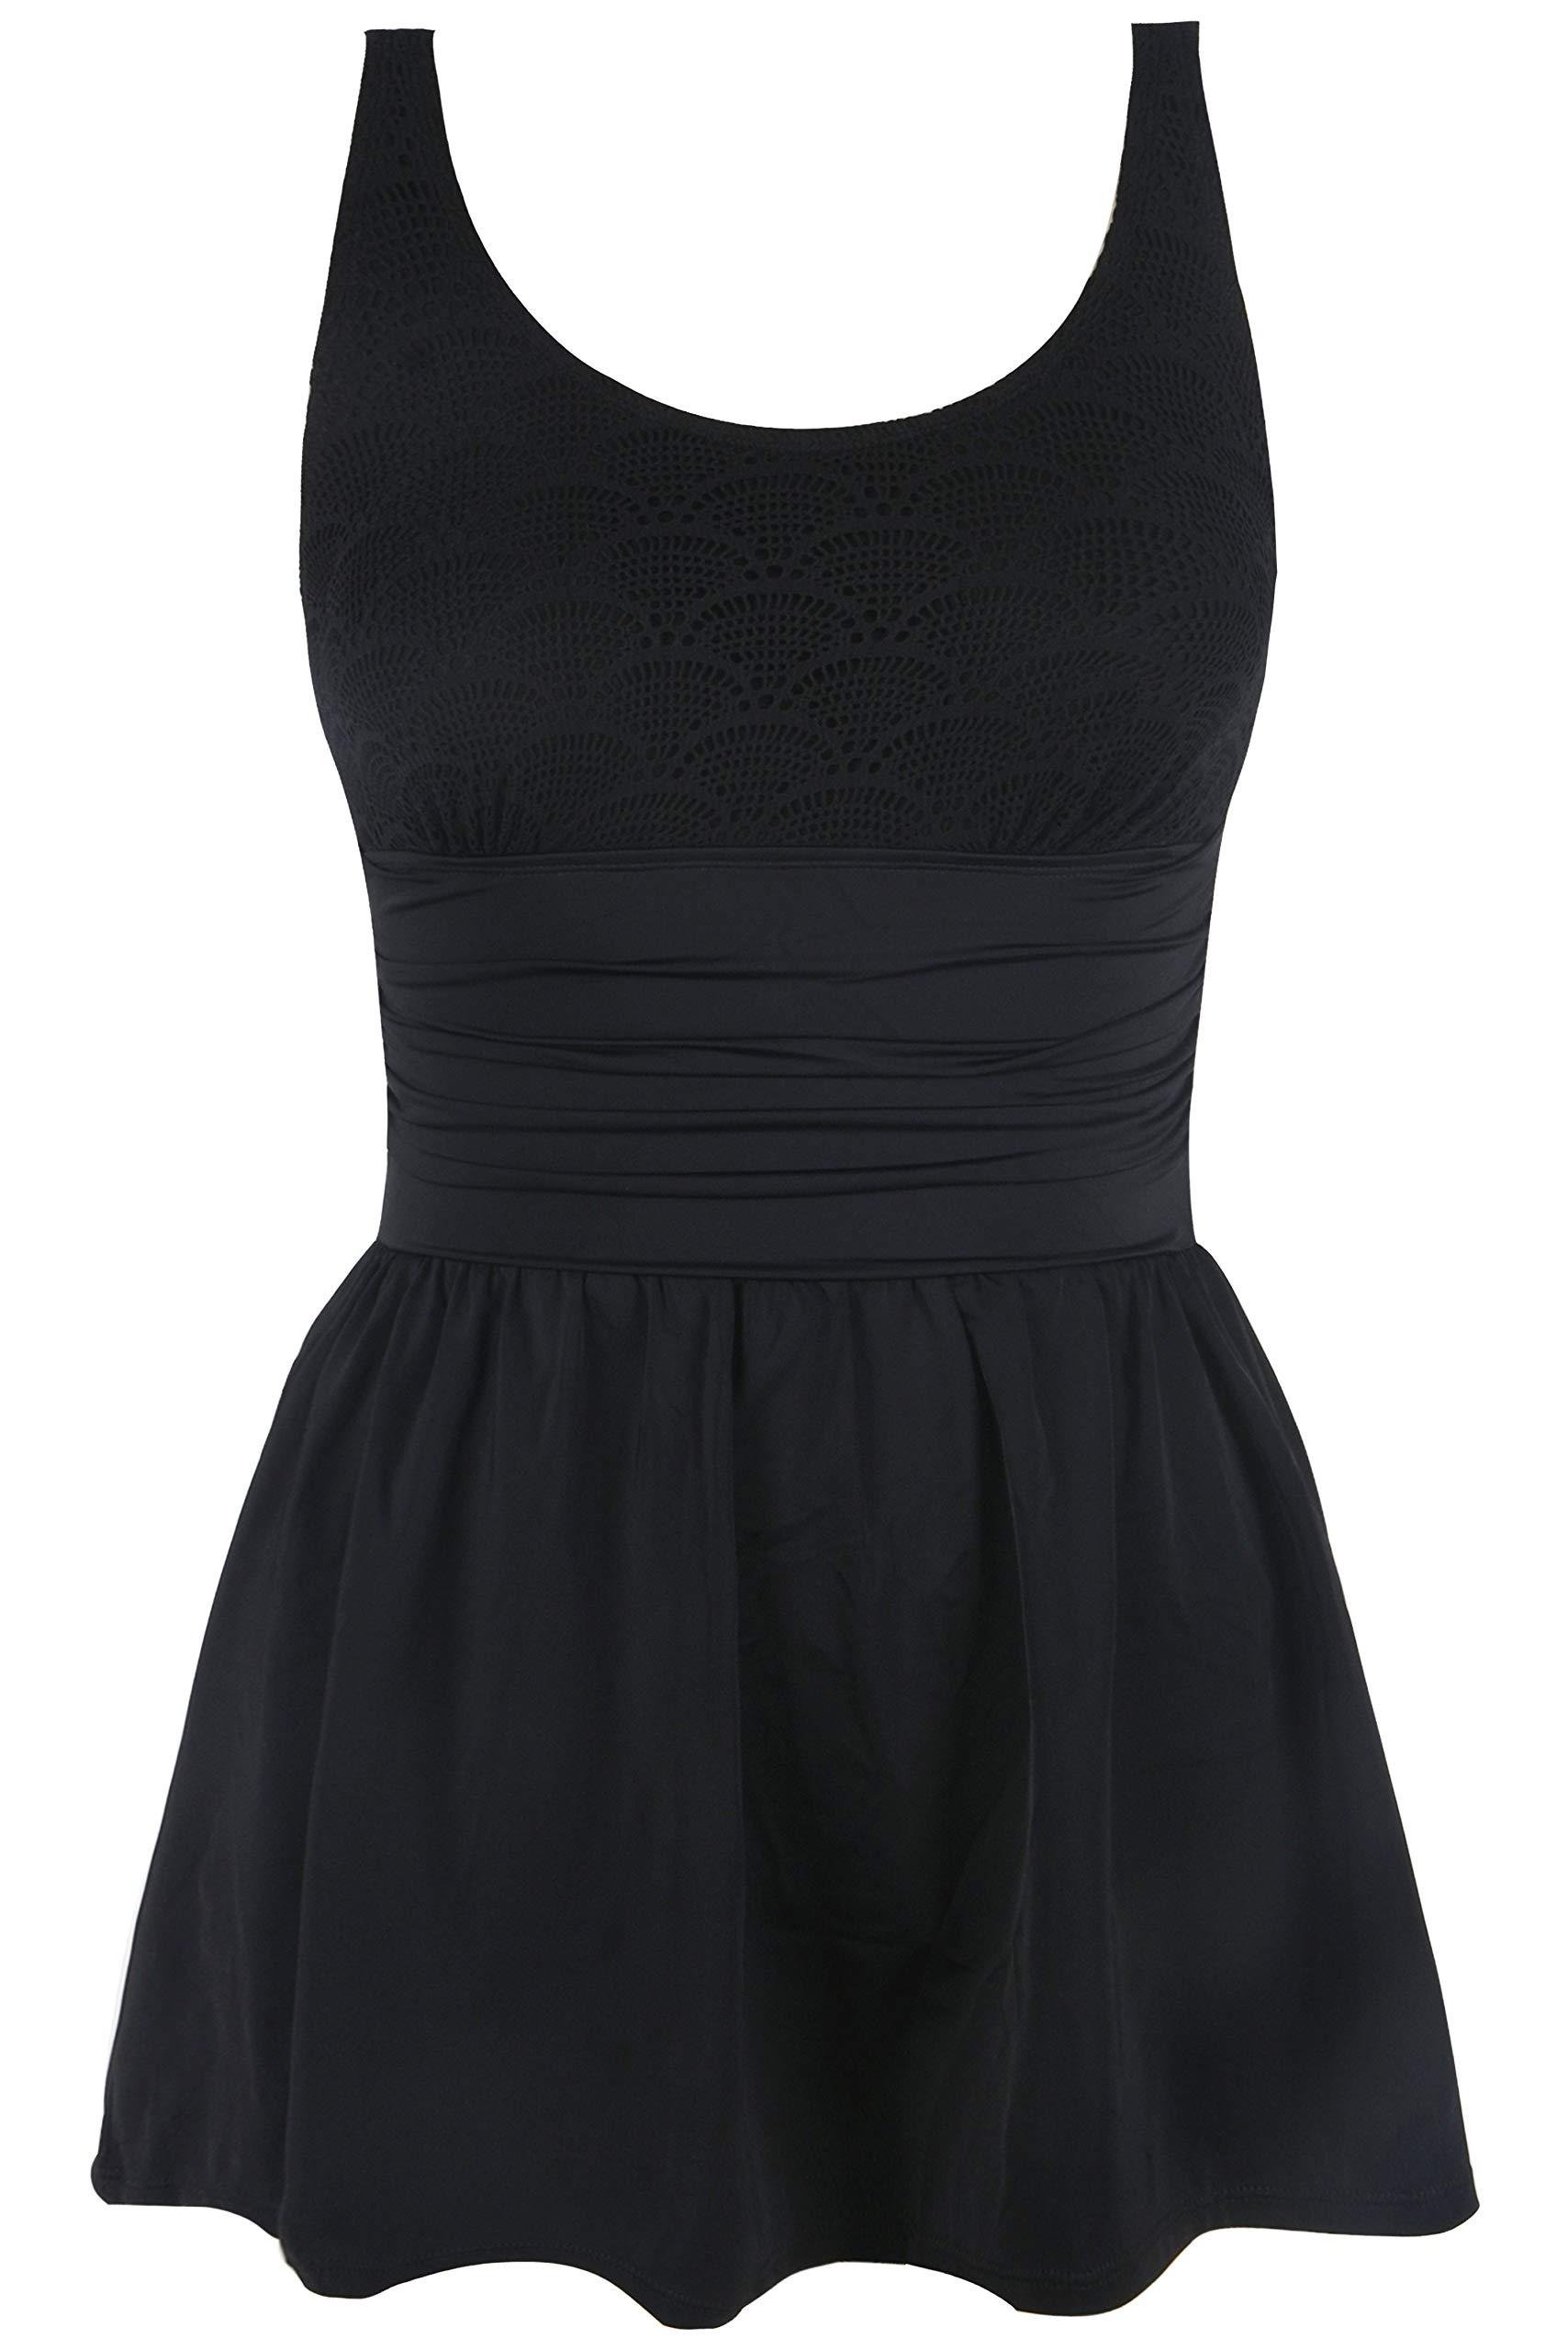 Septangle Women Tummy Control Swim Dress One Piece Skirt Swimsuit,US 8